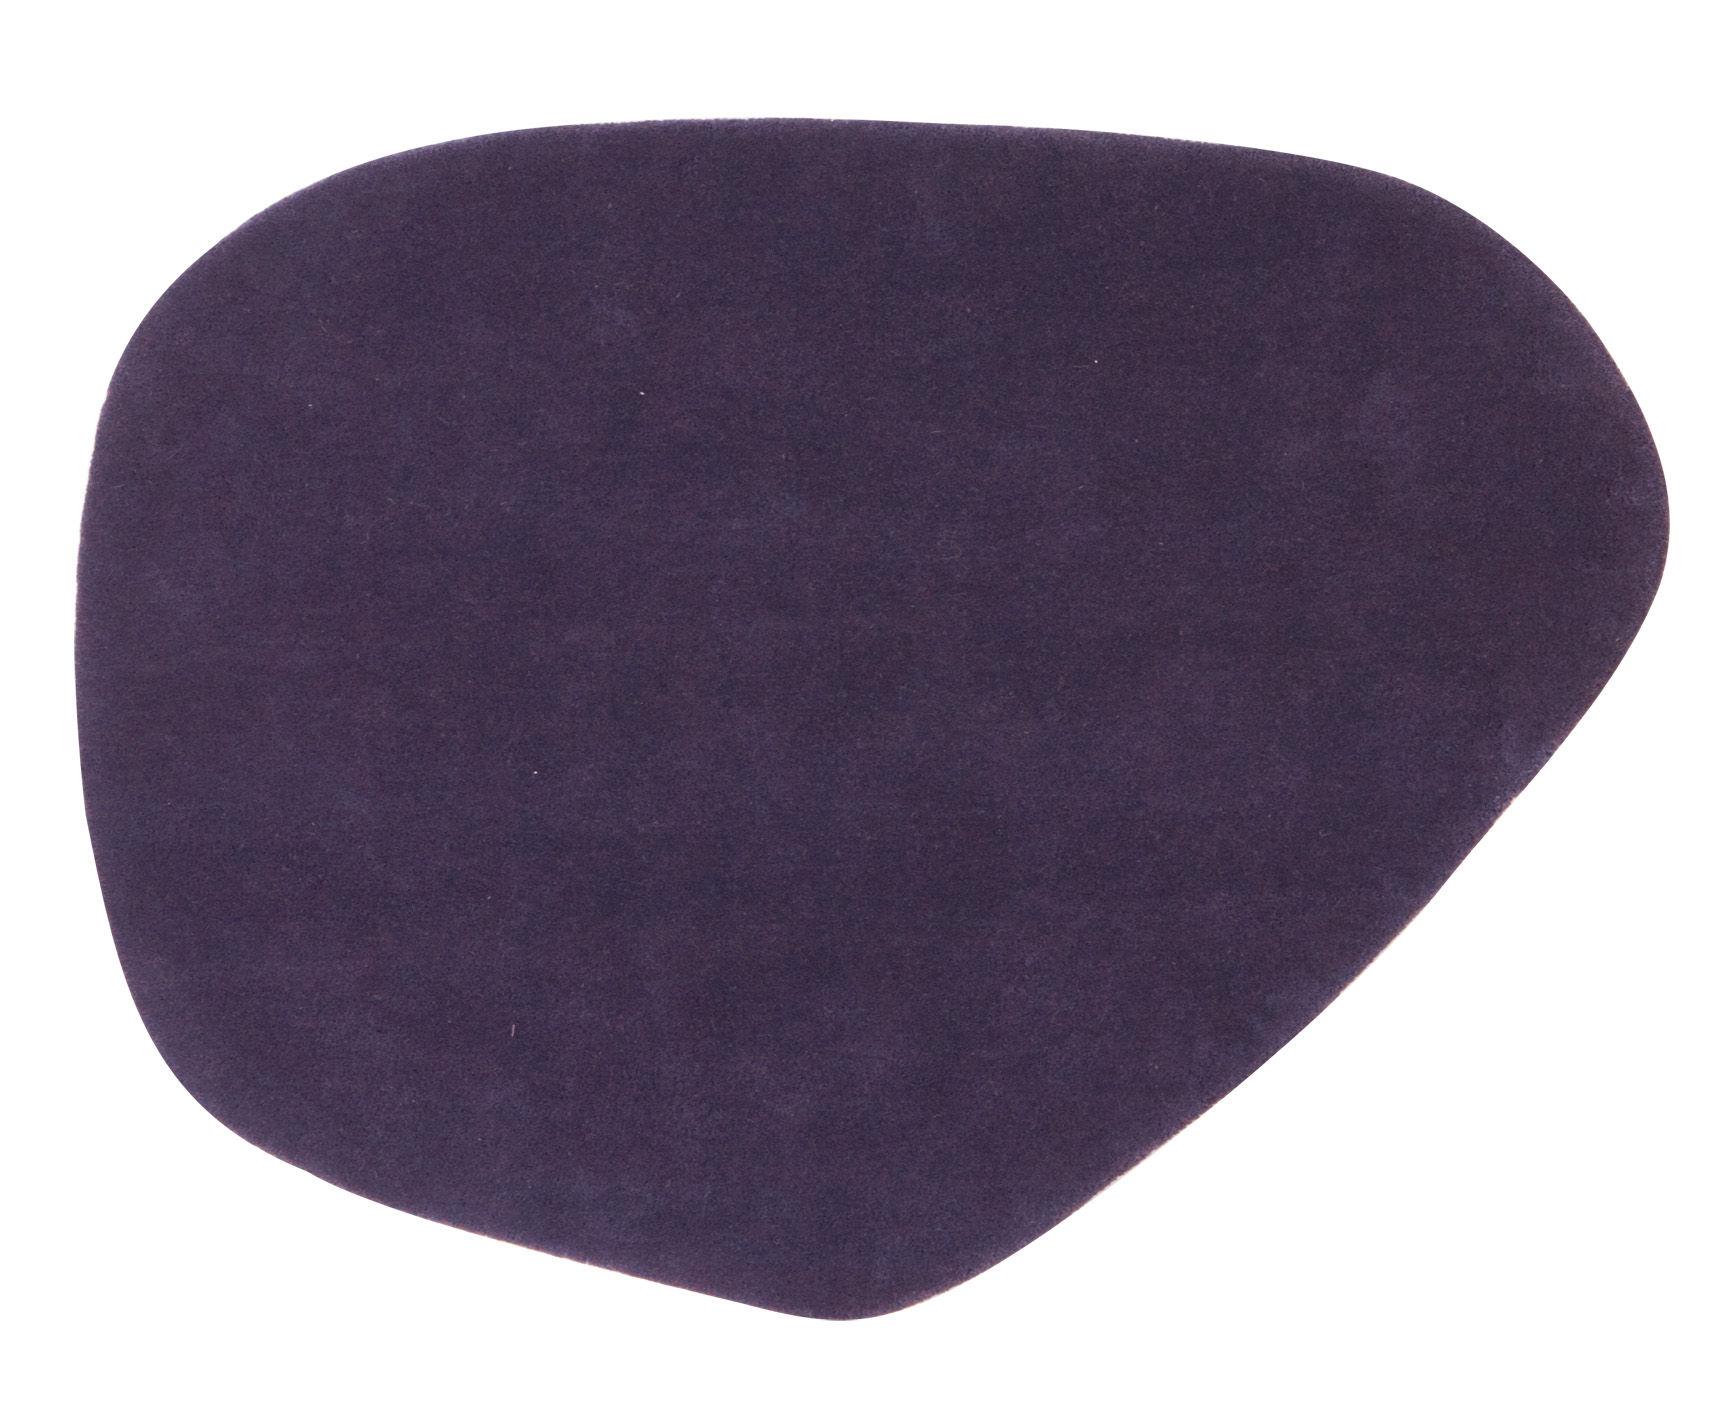 Arredamento - Tappeti  - Tappeto Calder - 90 x 120 cm di Nanimarquina - 90 x 120 cm / Viola - Lana